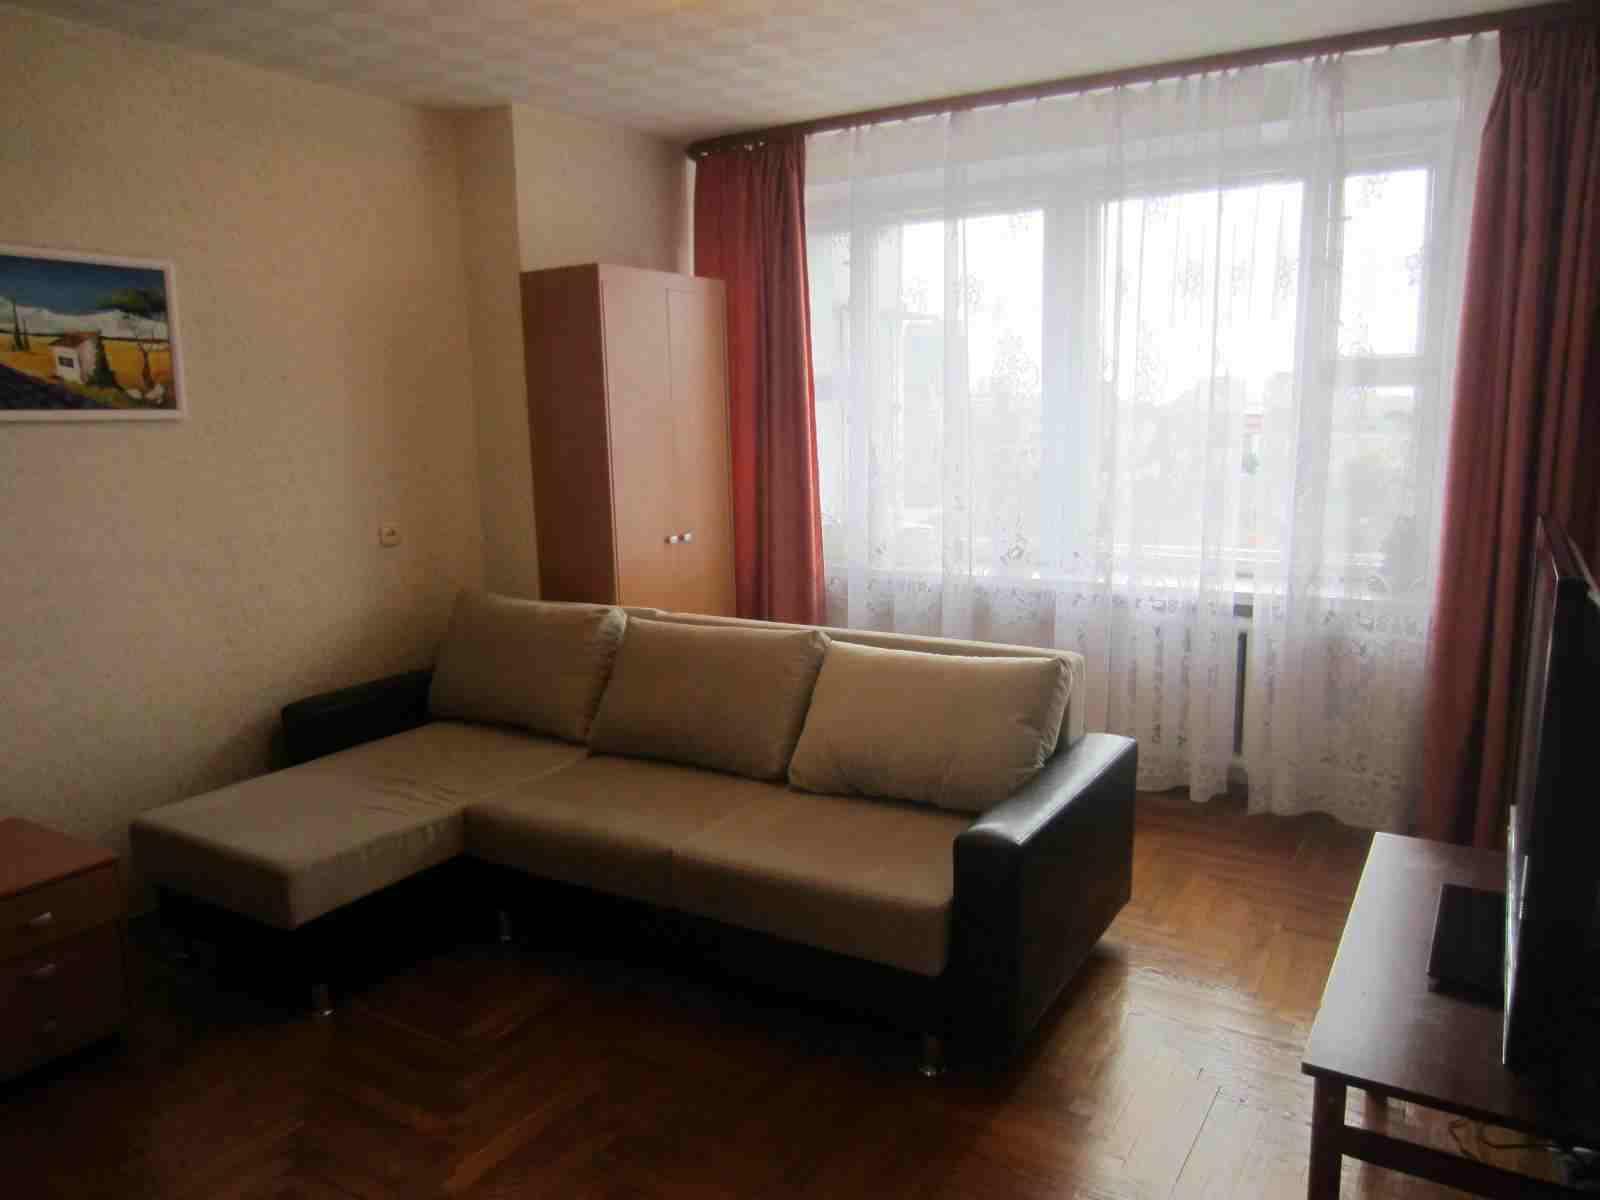 5-ти комнатная квартира в самом центре столицы на Немиге!. Фото